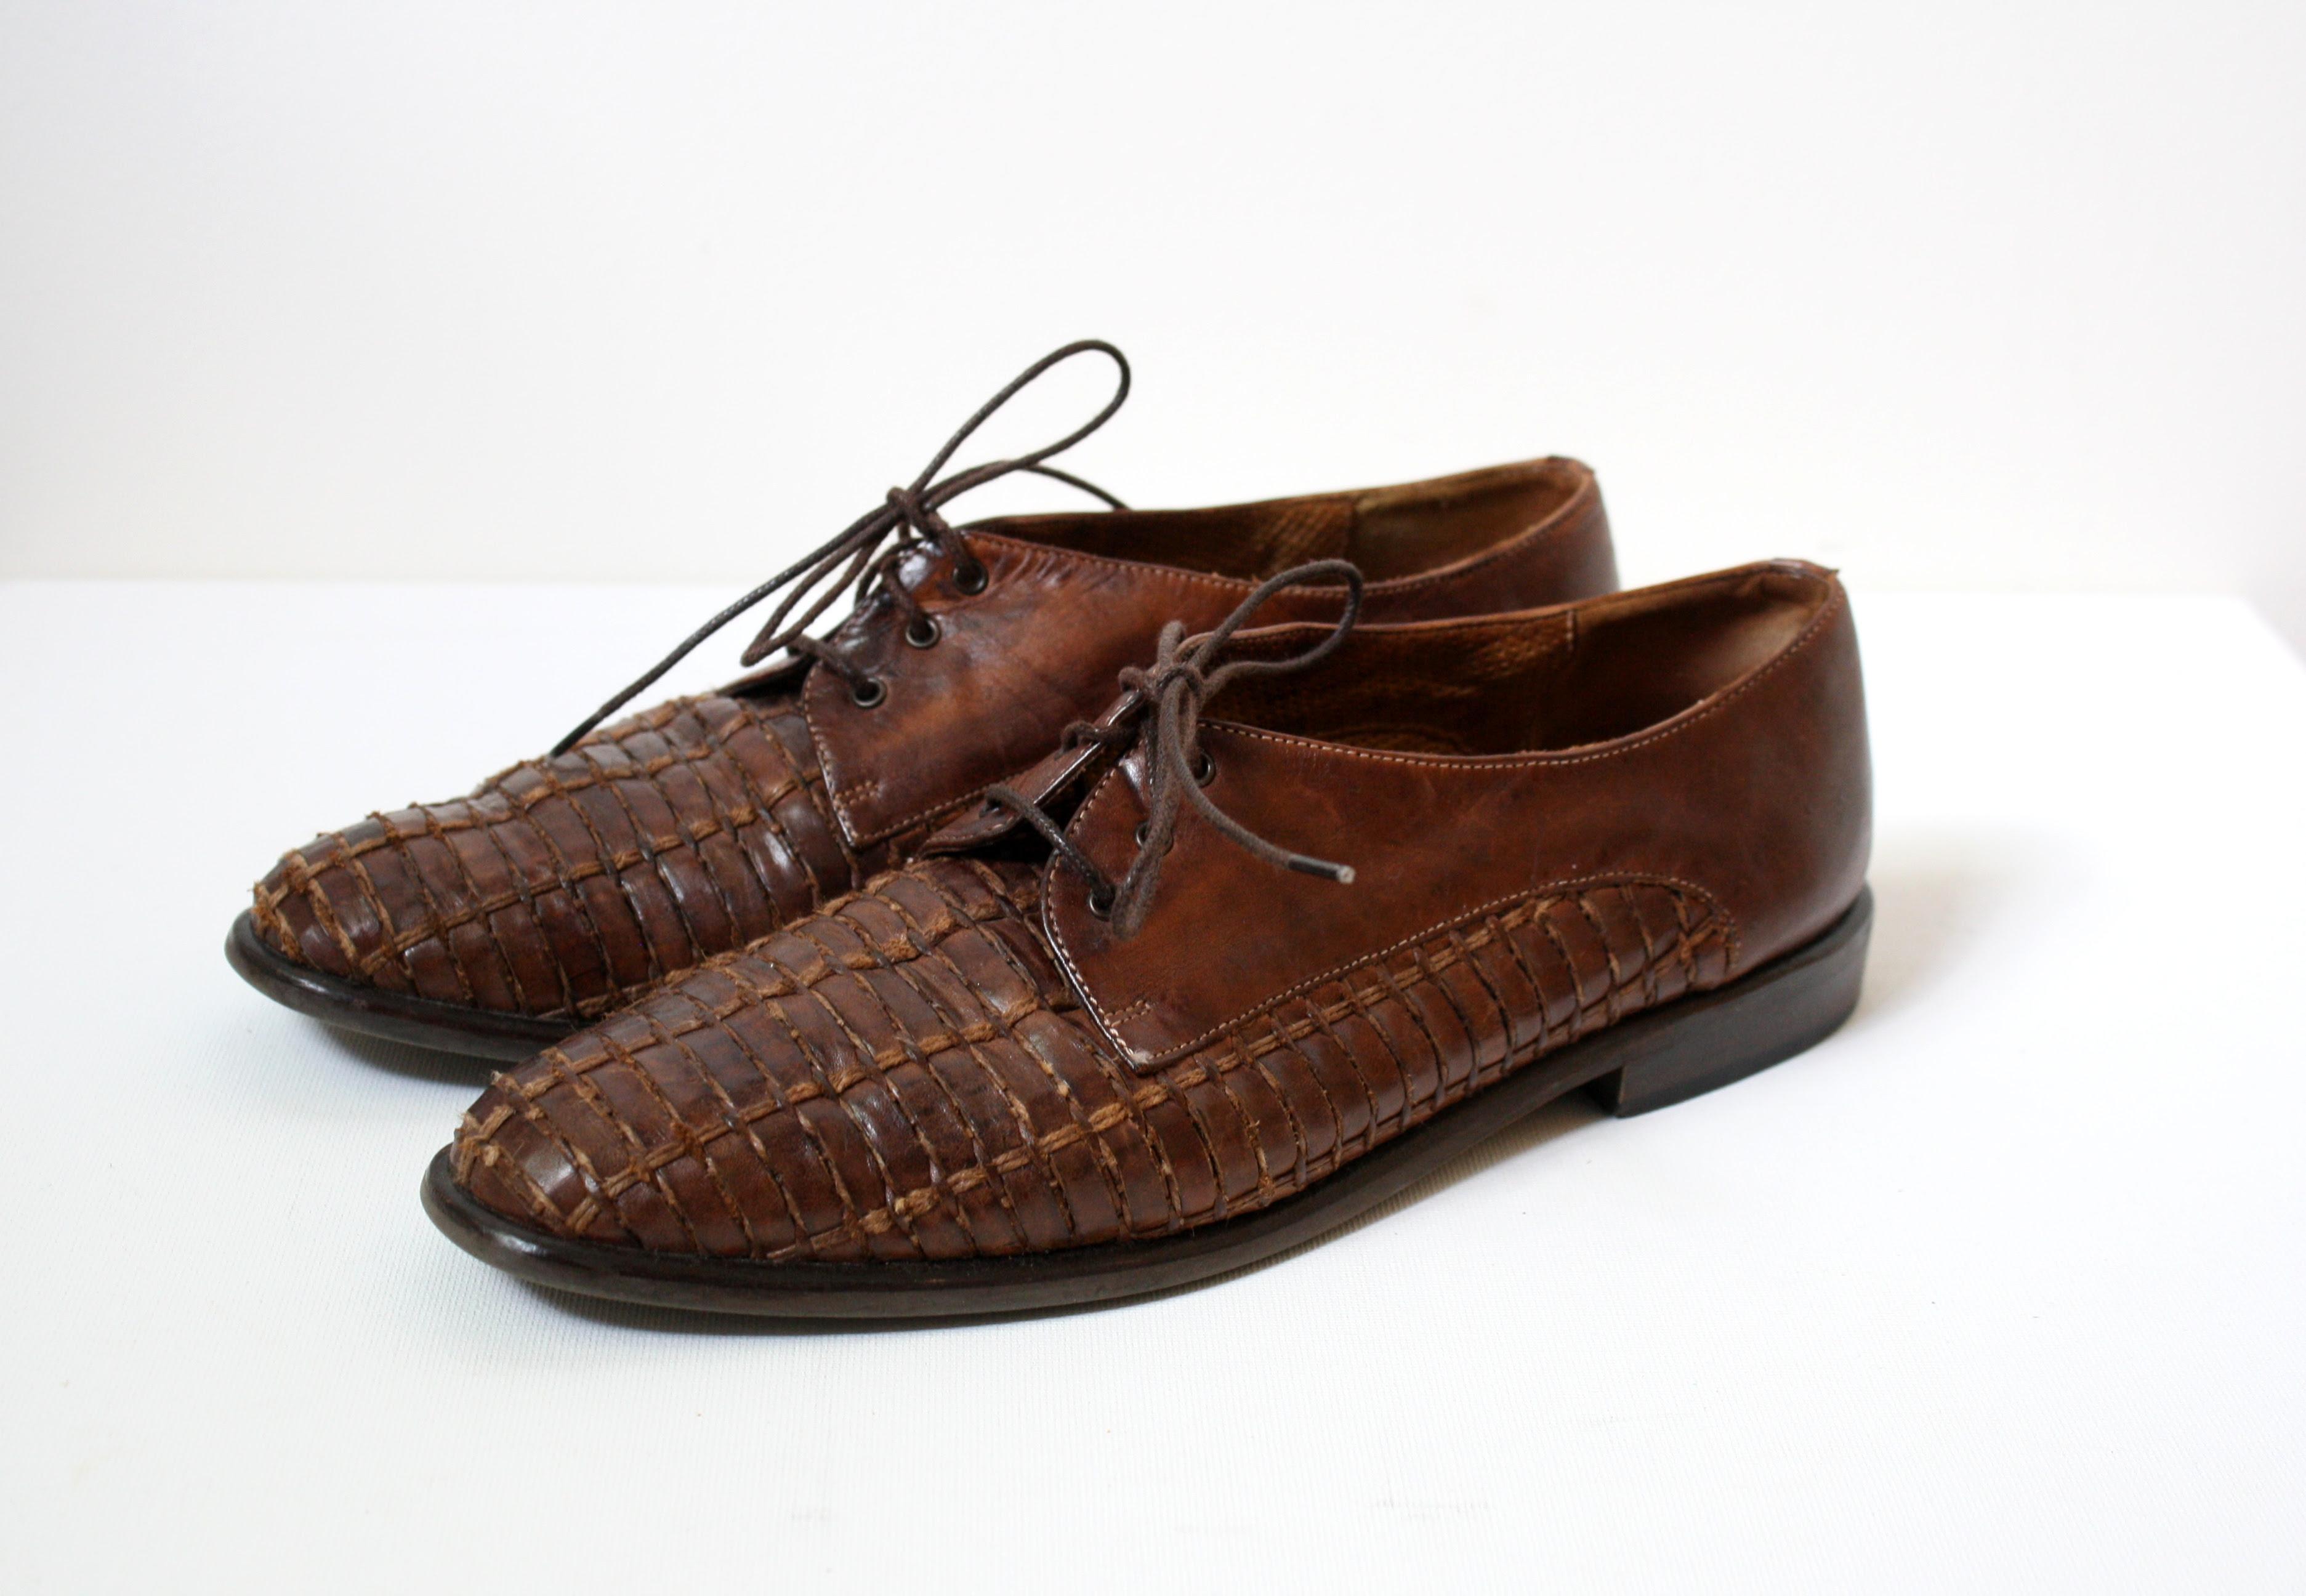 vintage woven oxfords